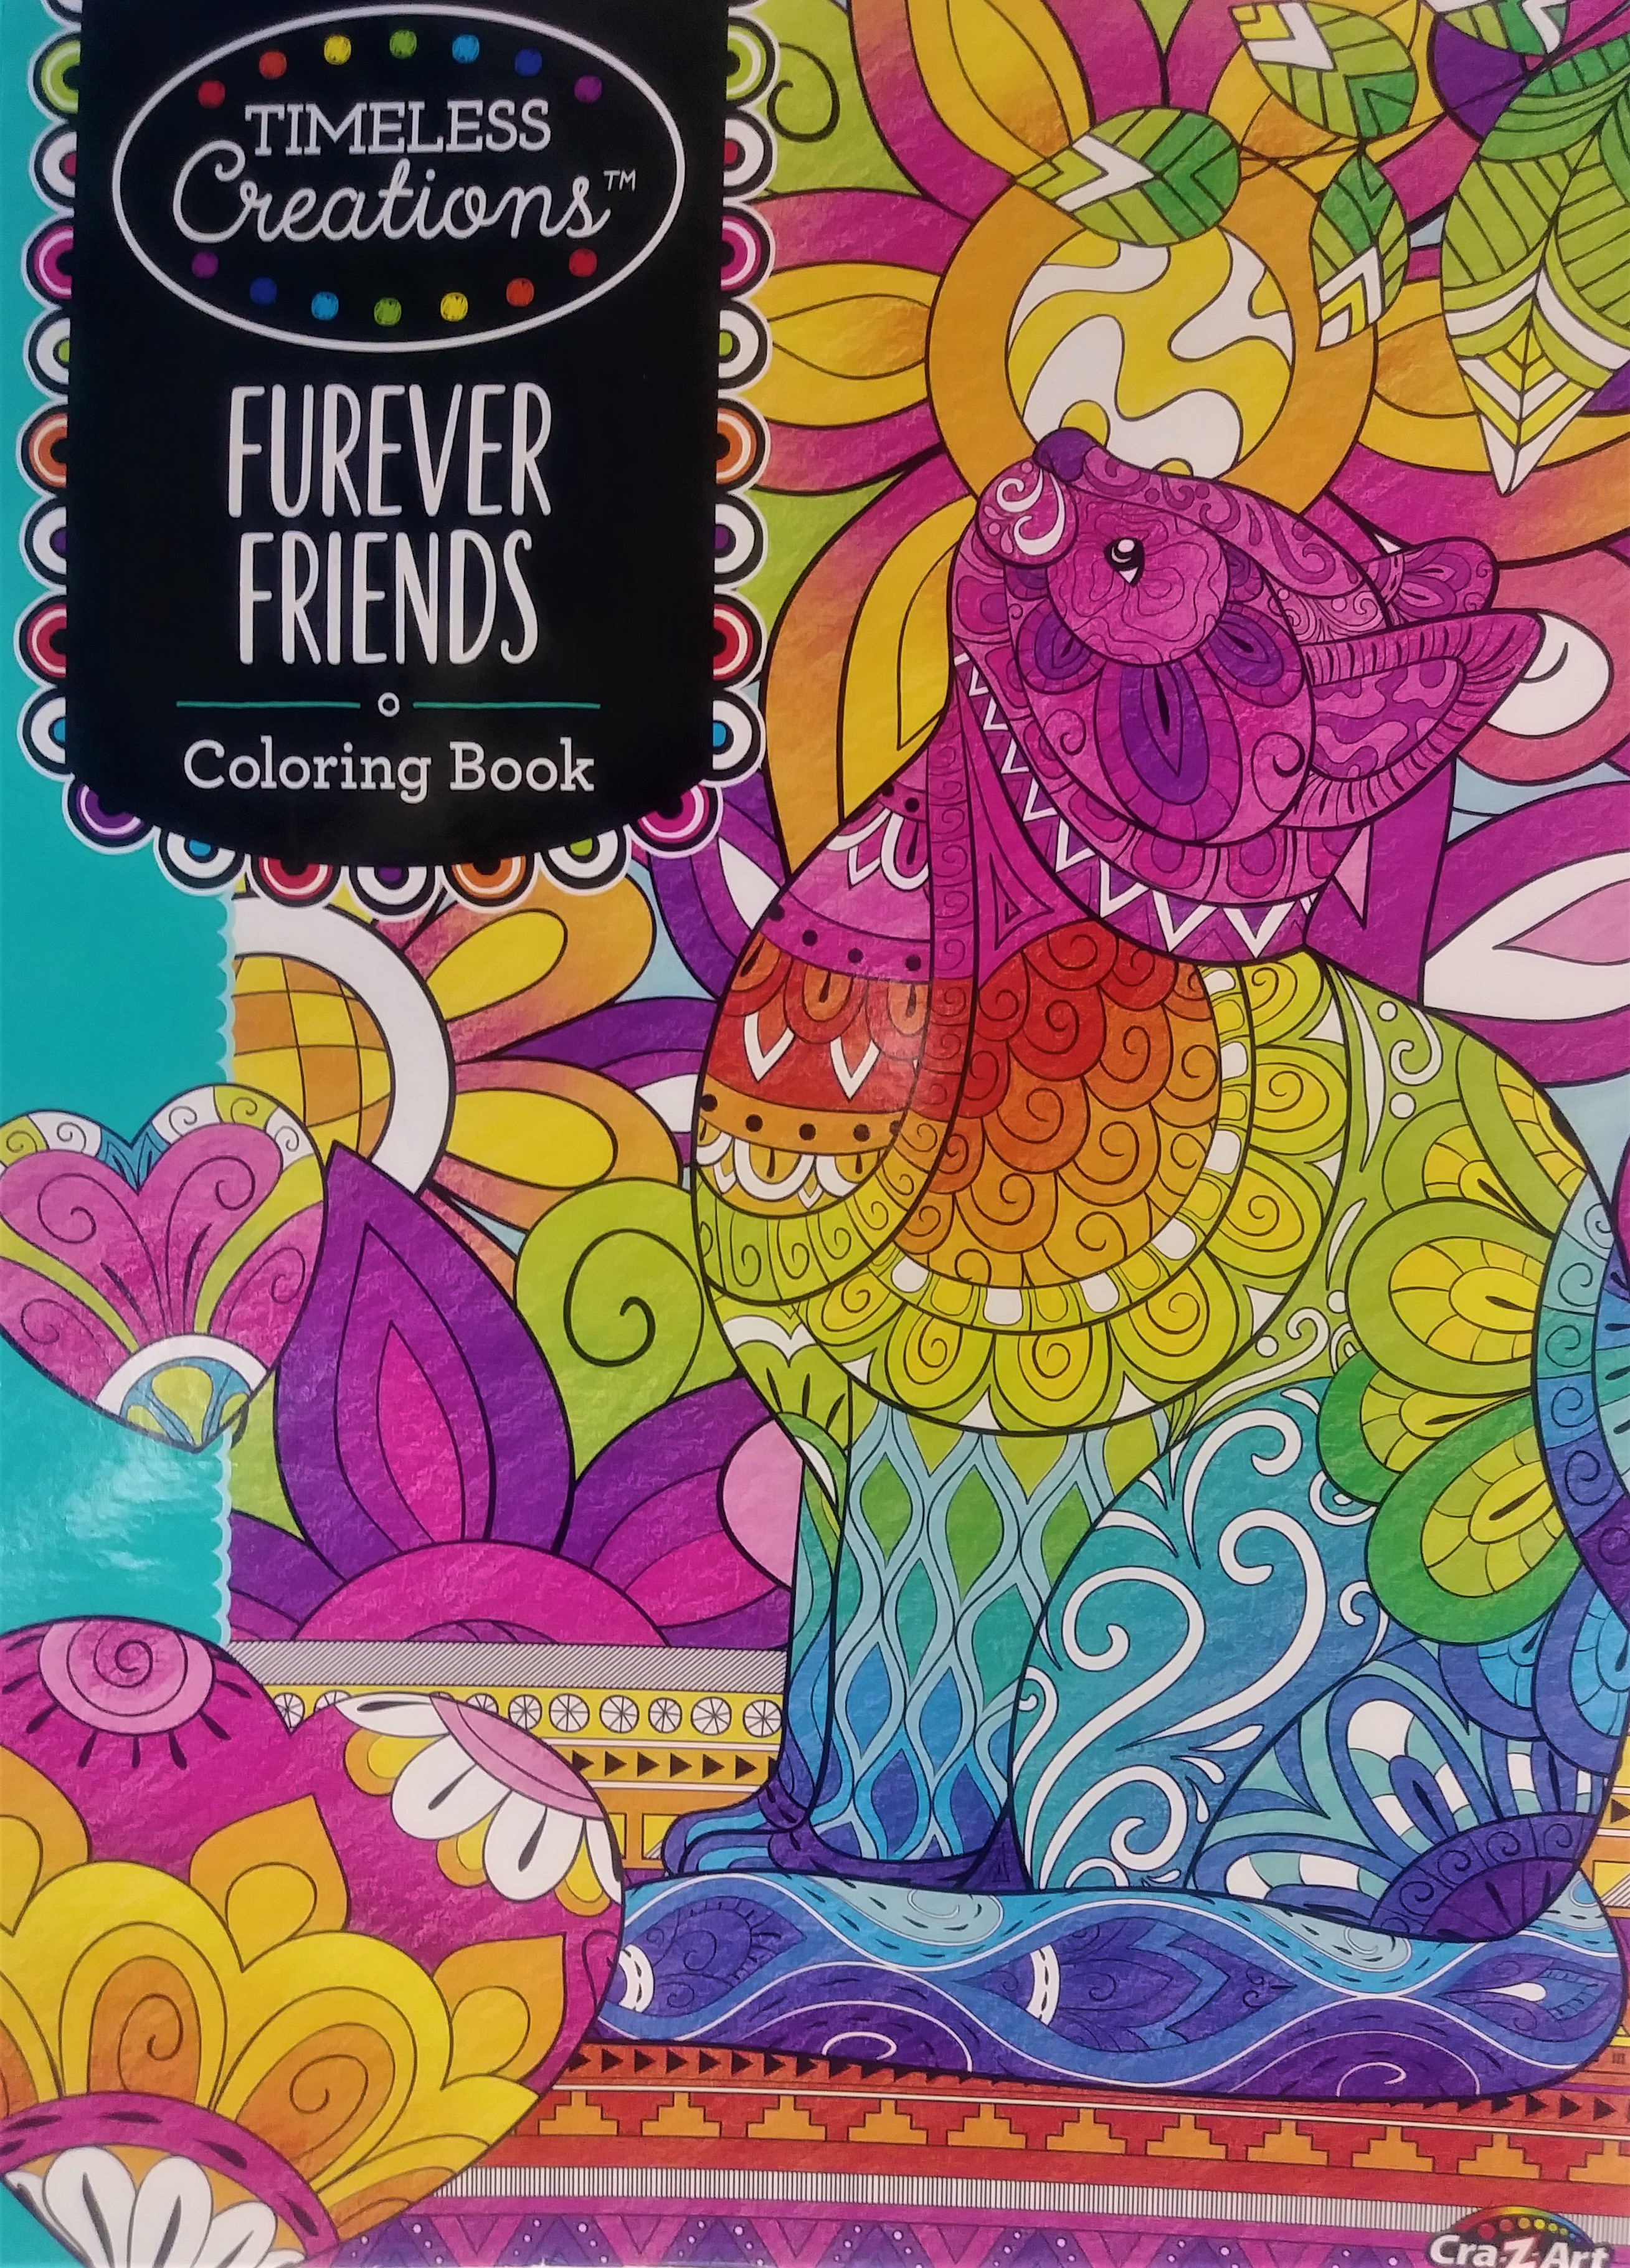 - Cra-Z-Art Timeless Creations Coloring Book, Furever Friends, 64 Pages -  Walmart.com - Walmart.com